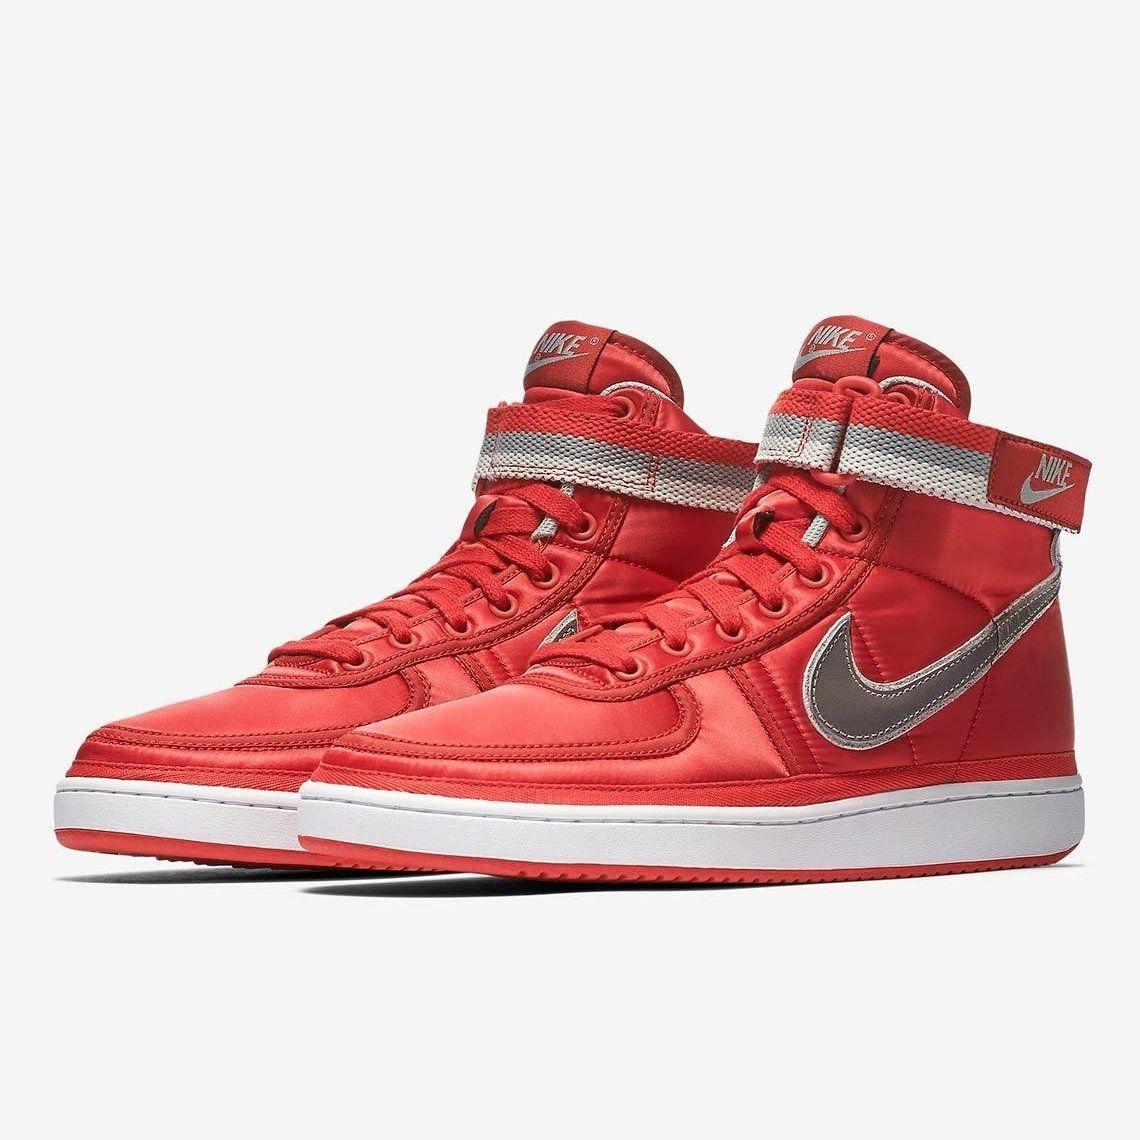 5a2dcfe1da2fcc Nike Vandal High Supreme QS UNIVERSITY RED METALLIC SILVER-WHITE (AH8652-002)